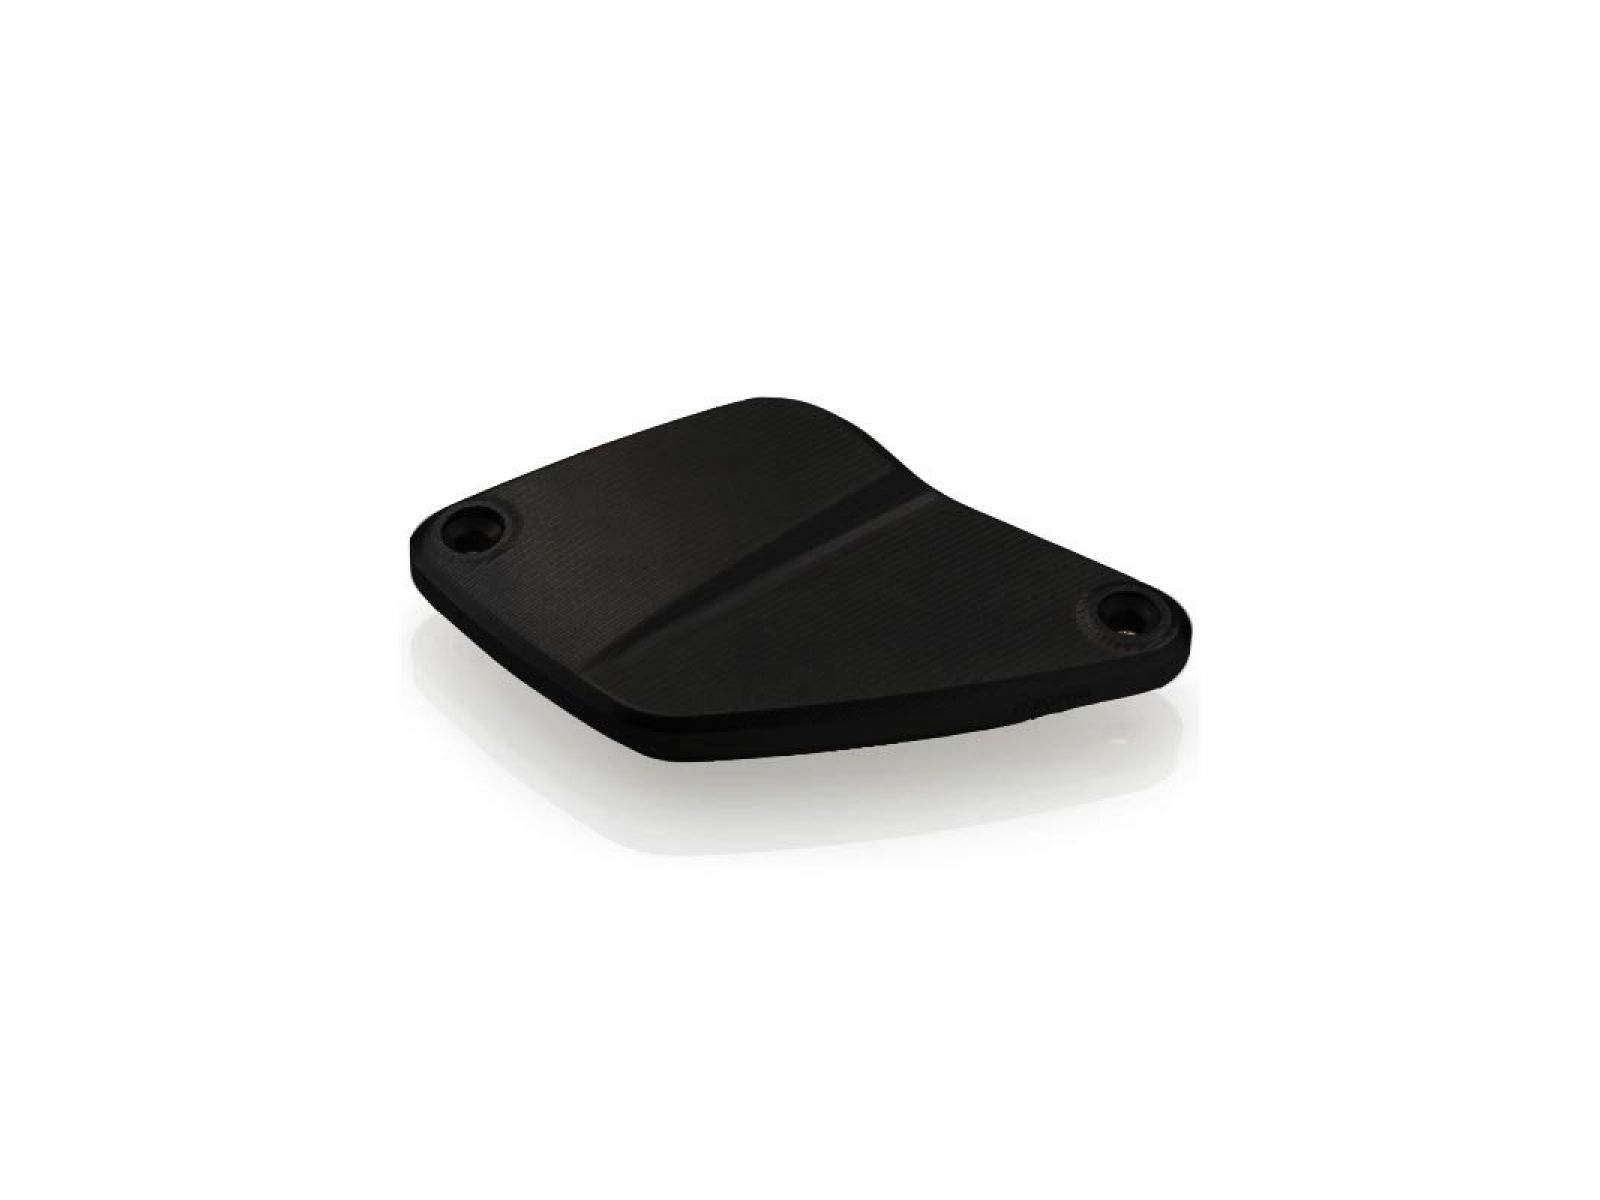 Крышка тормозного бачка Rizoma для Ducati Diavel 11-16, XDiavel 16-17